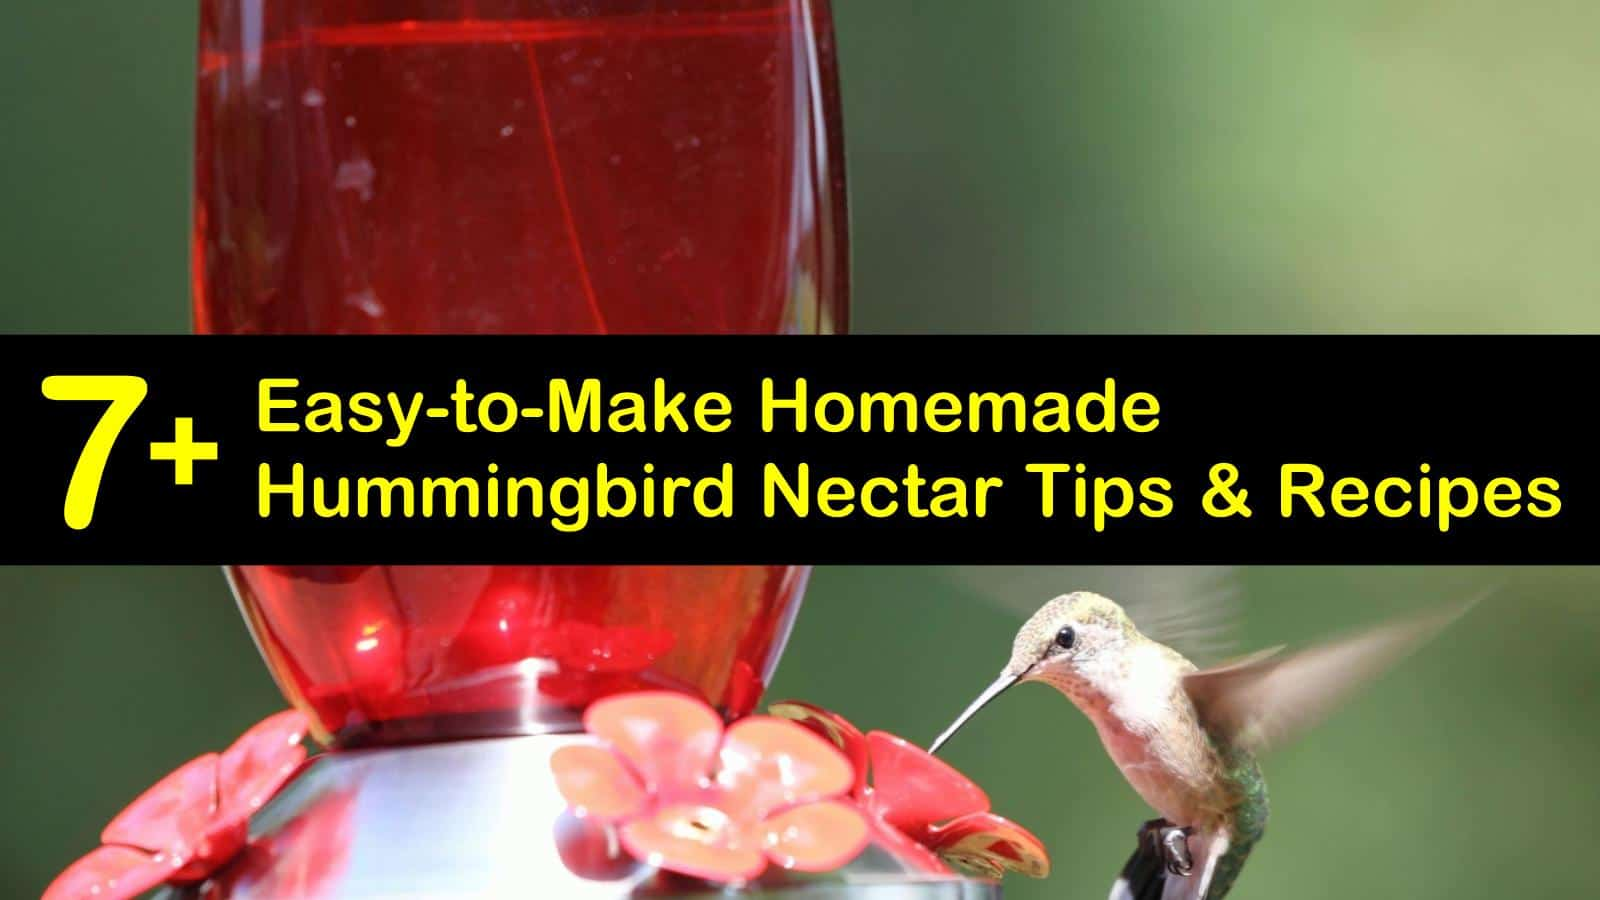 homemade hummingbird nectar recipes titleimg1